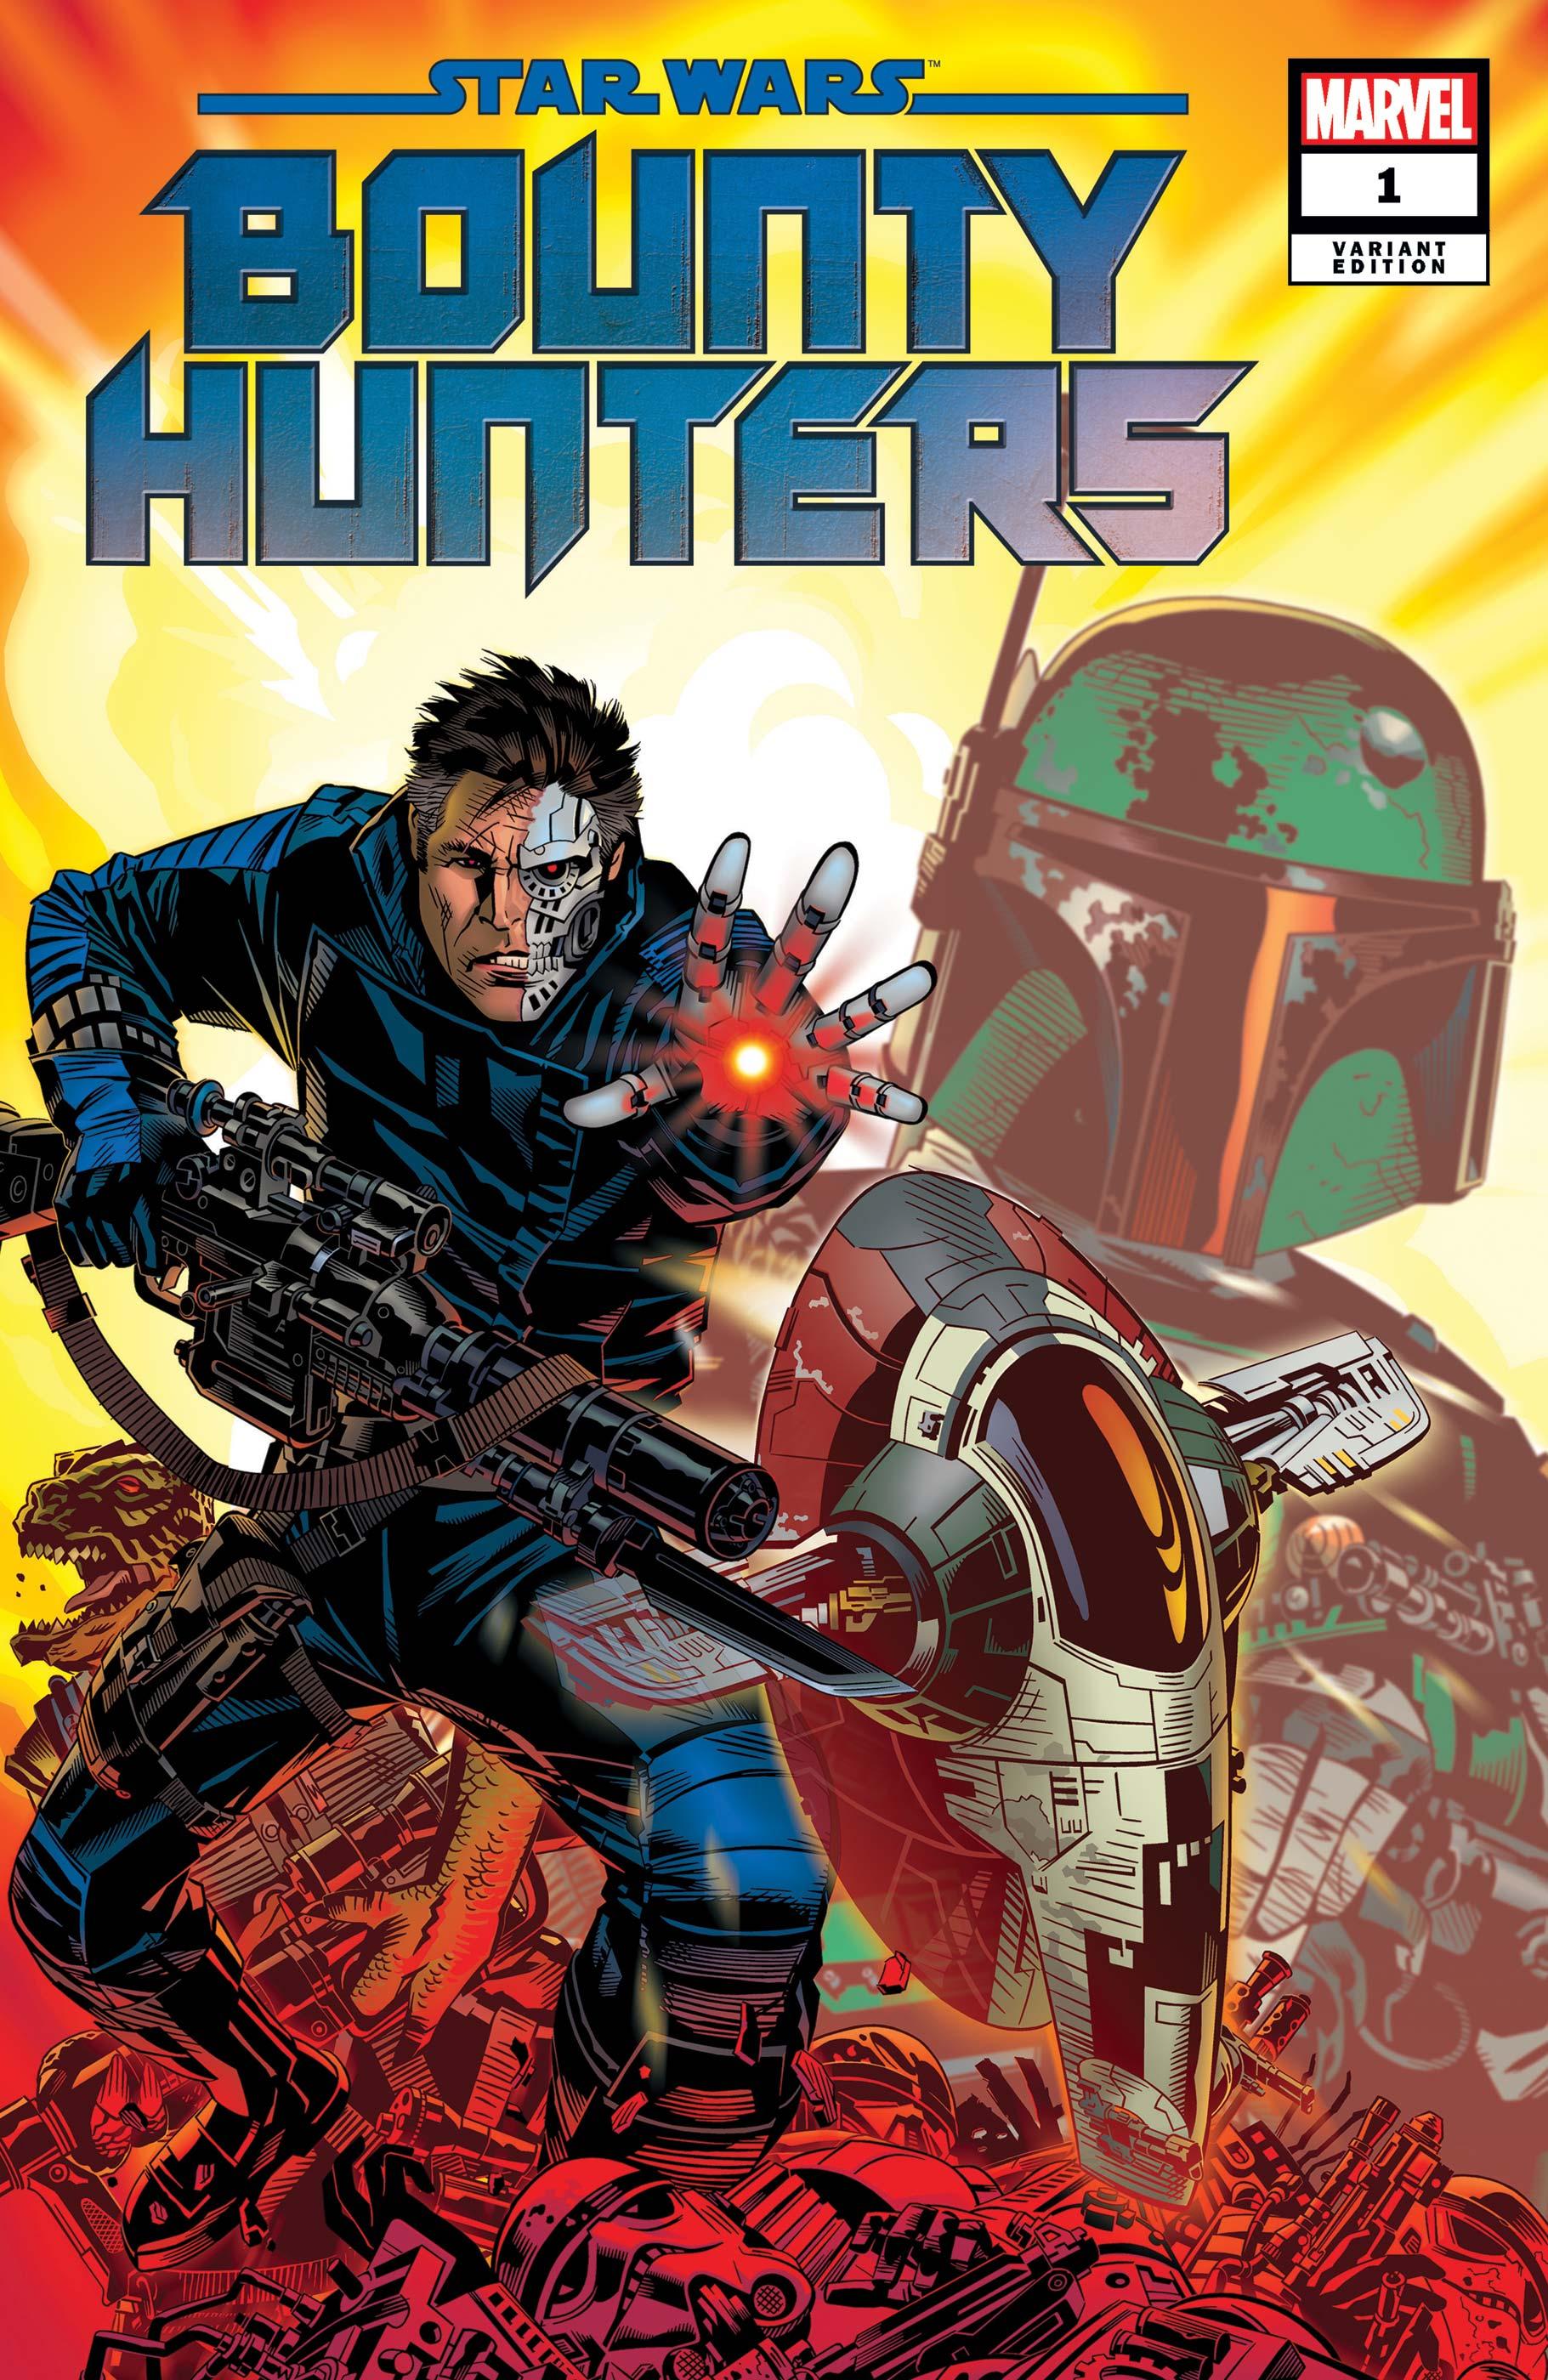 Star Wars: Bounty Hunters (2020) #1 (Variant)